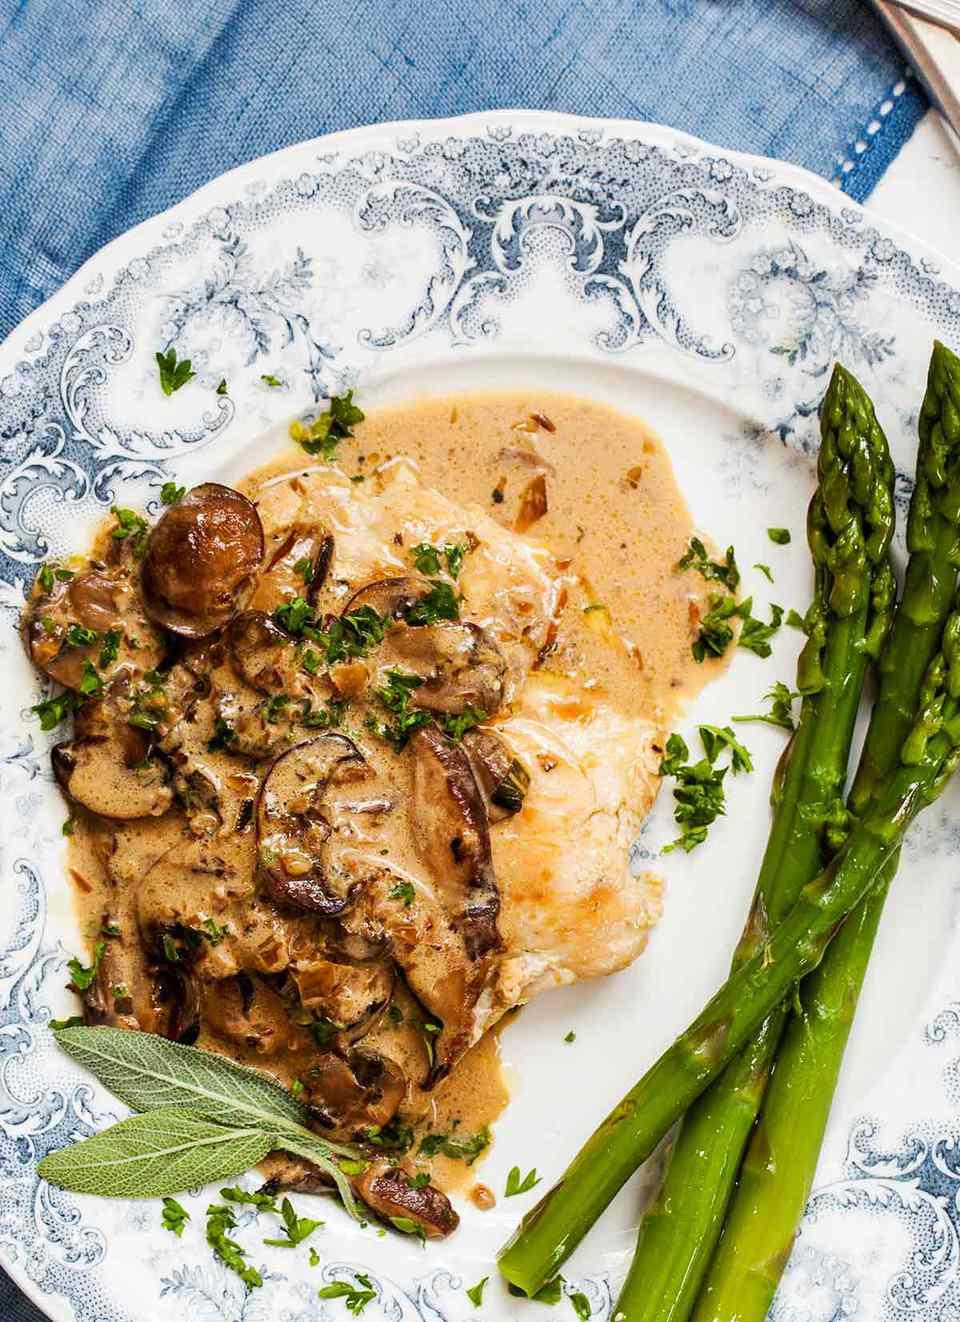 Chicken with Mushroom Sage Sauce